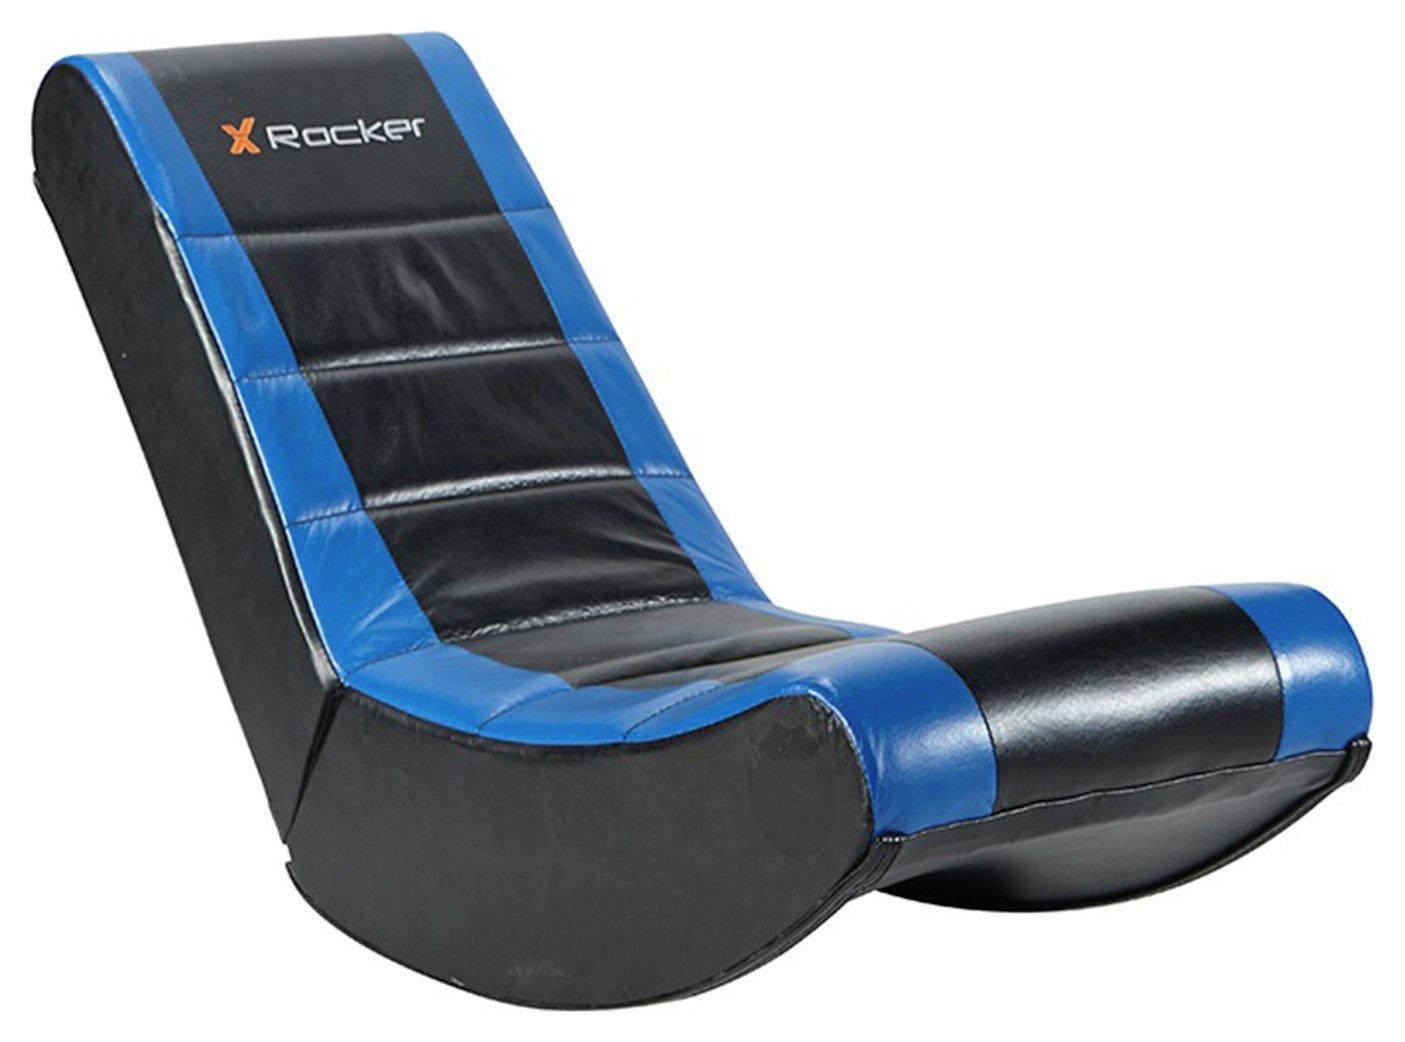 X Rocker Gaming Chair - Black and Blue.